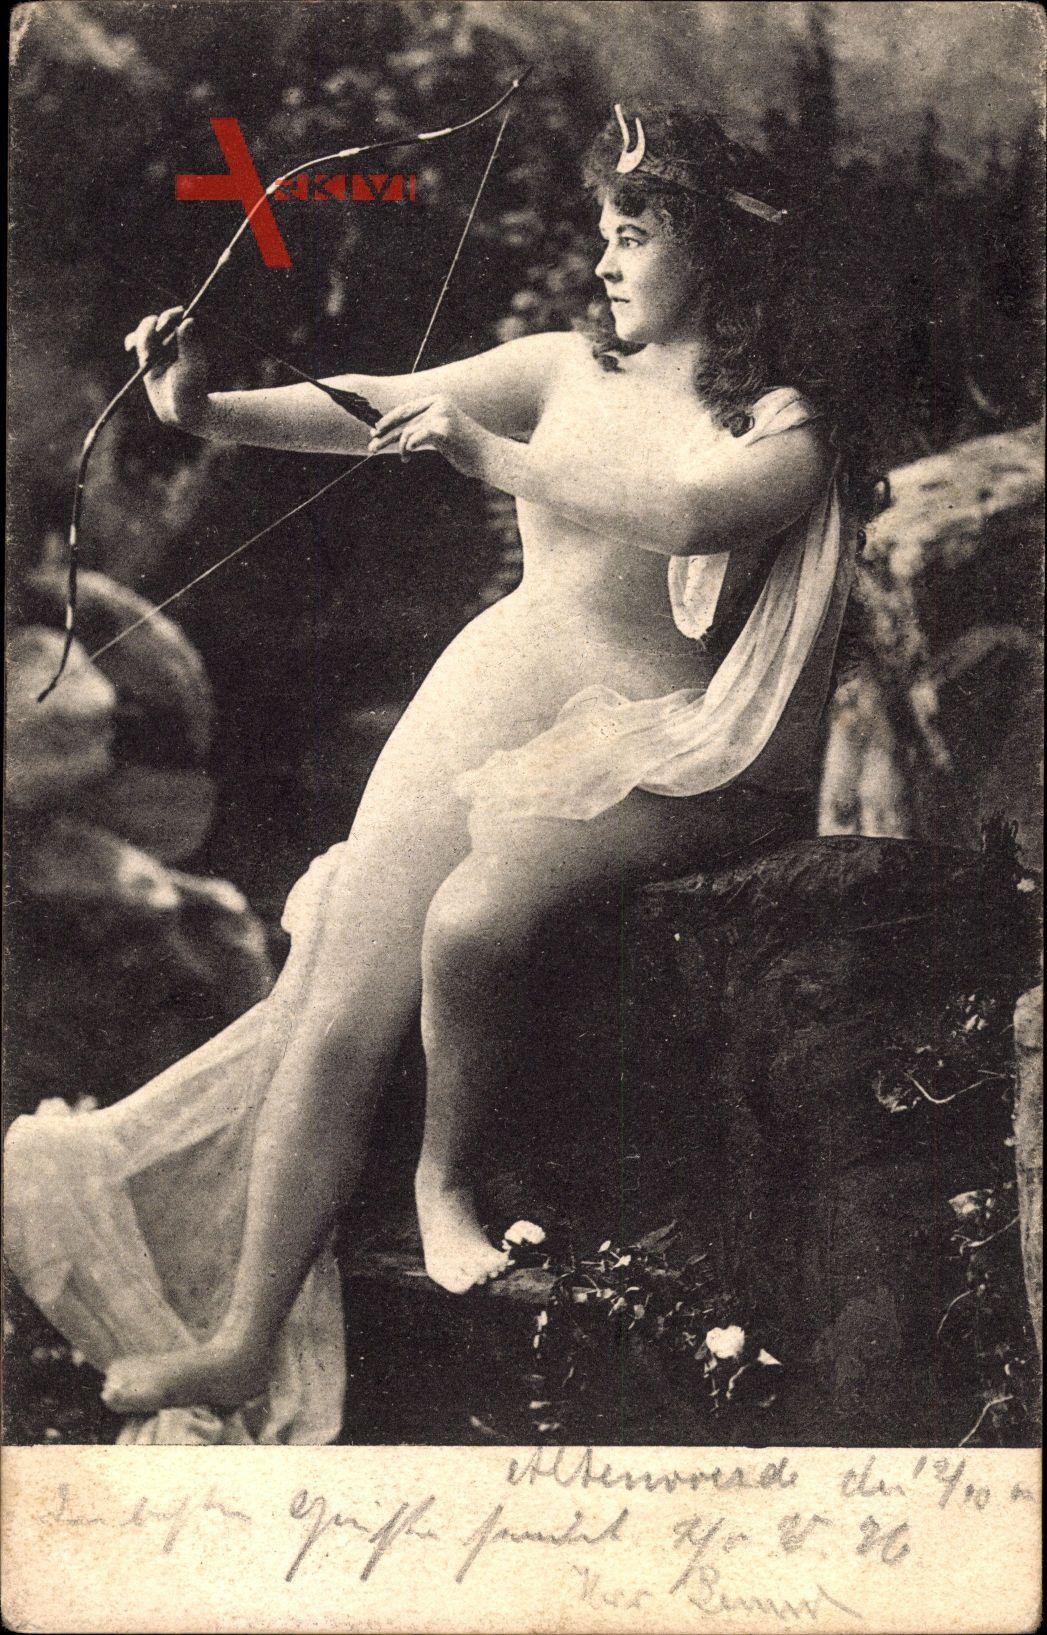 Junge Frau in hautengem Kleid, Bogen, Pfeil, Diadem